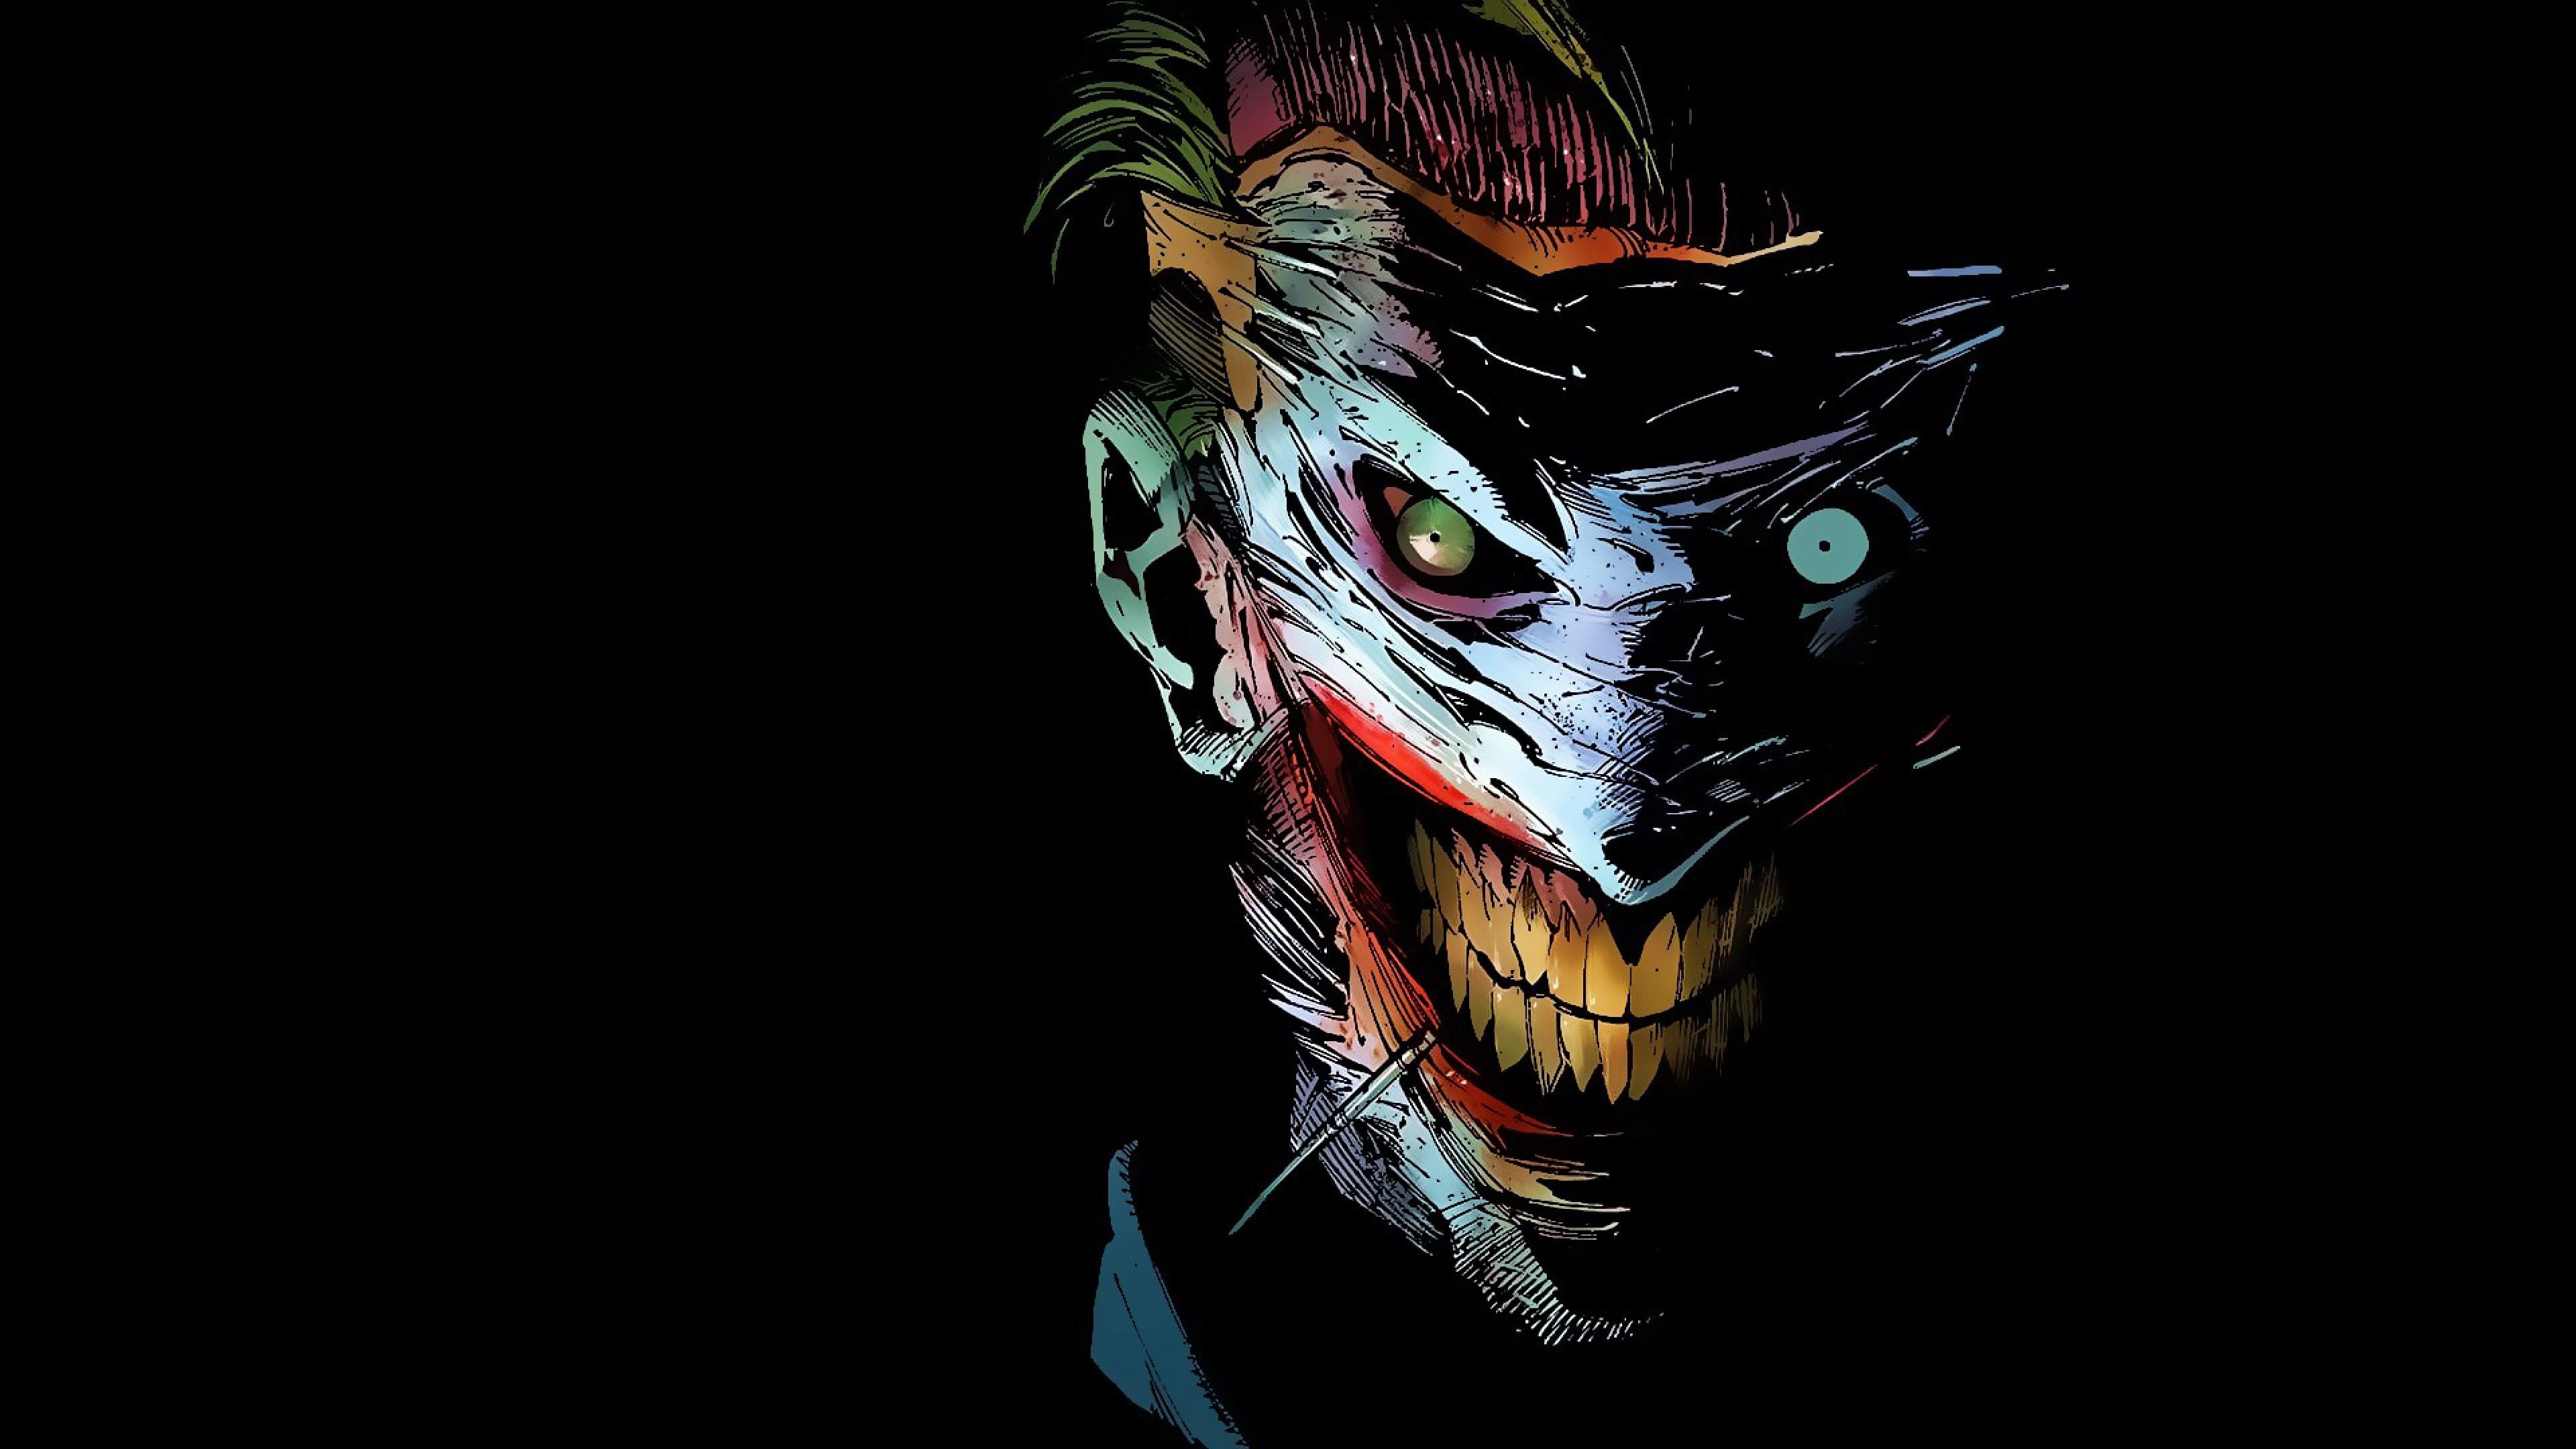 New Joker Wallpaper Joker Images and Wallpapers for Mac PC   HD Wallpapers    Pinterest   Joker images and Wallpaper